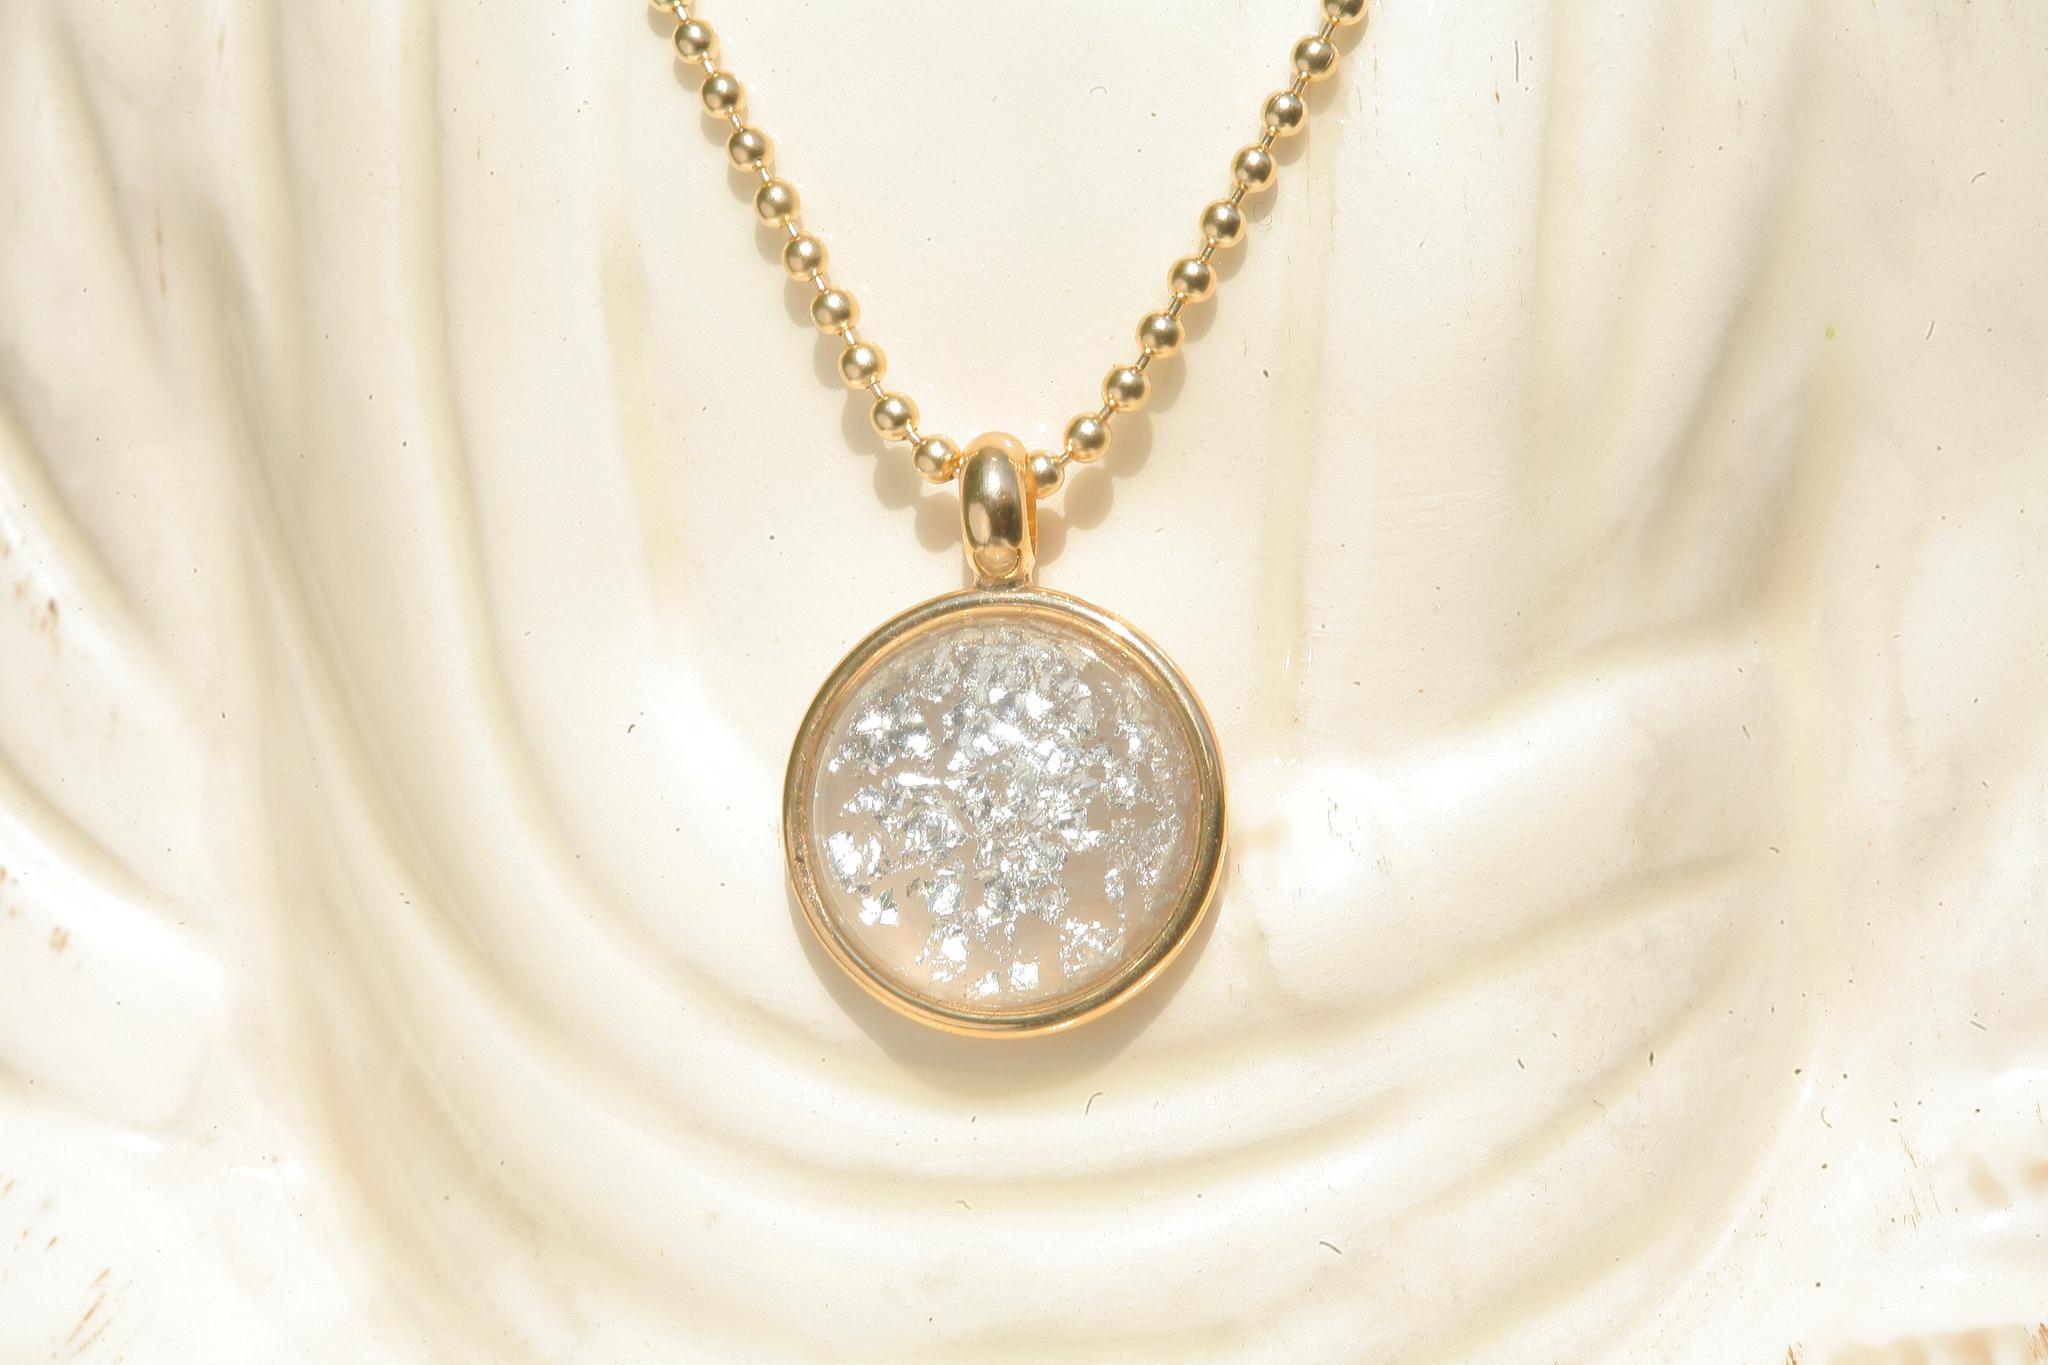 artjany vergoldete Halskette crystal crash